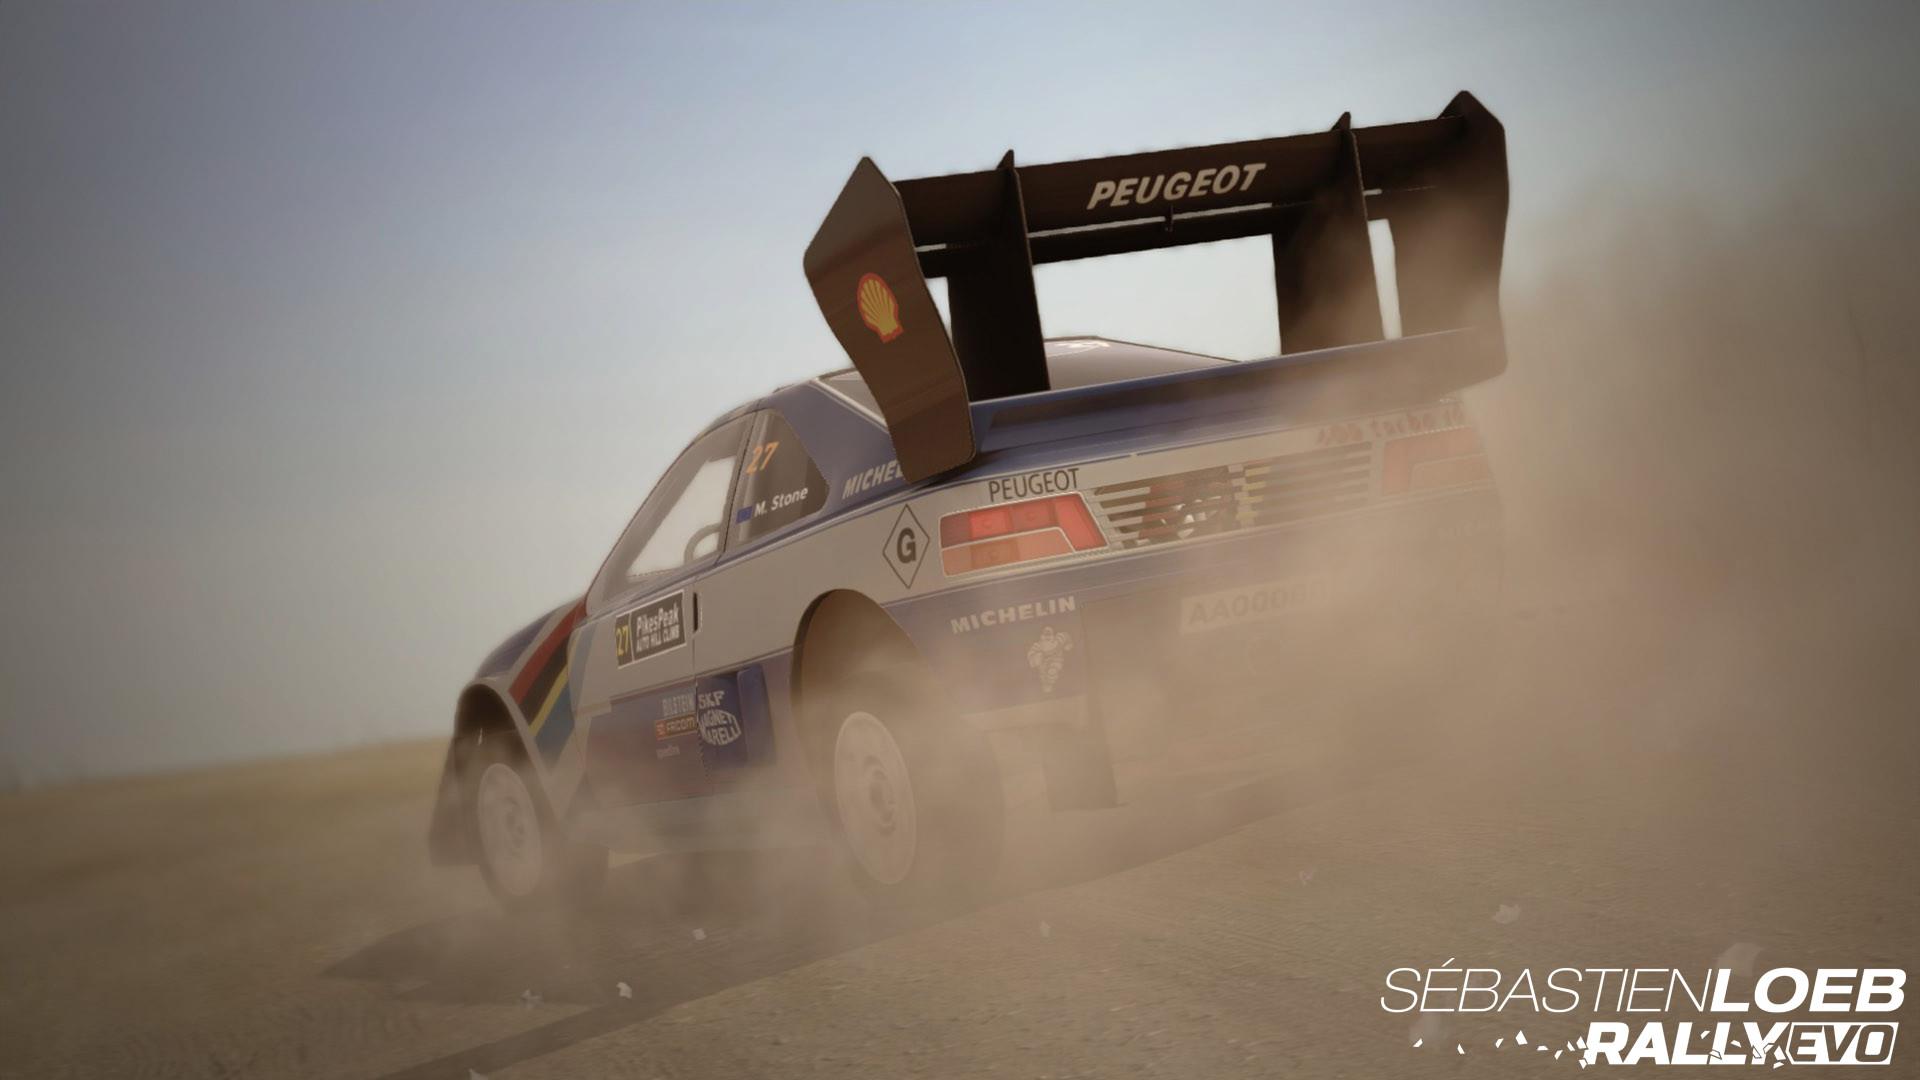 Sébastien Loeb Rally EVO - Pikes Peak Pack Peugeot 405 T 16 PP screenshot